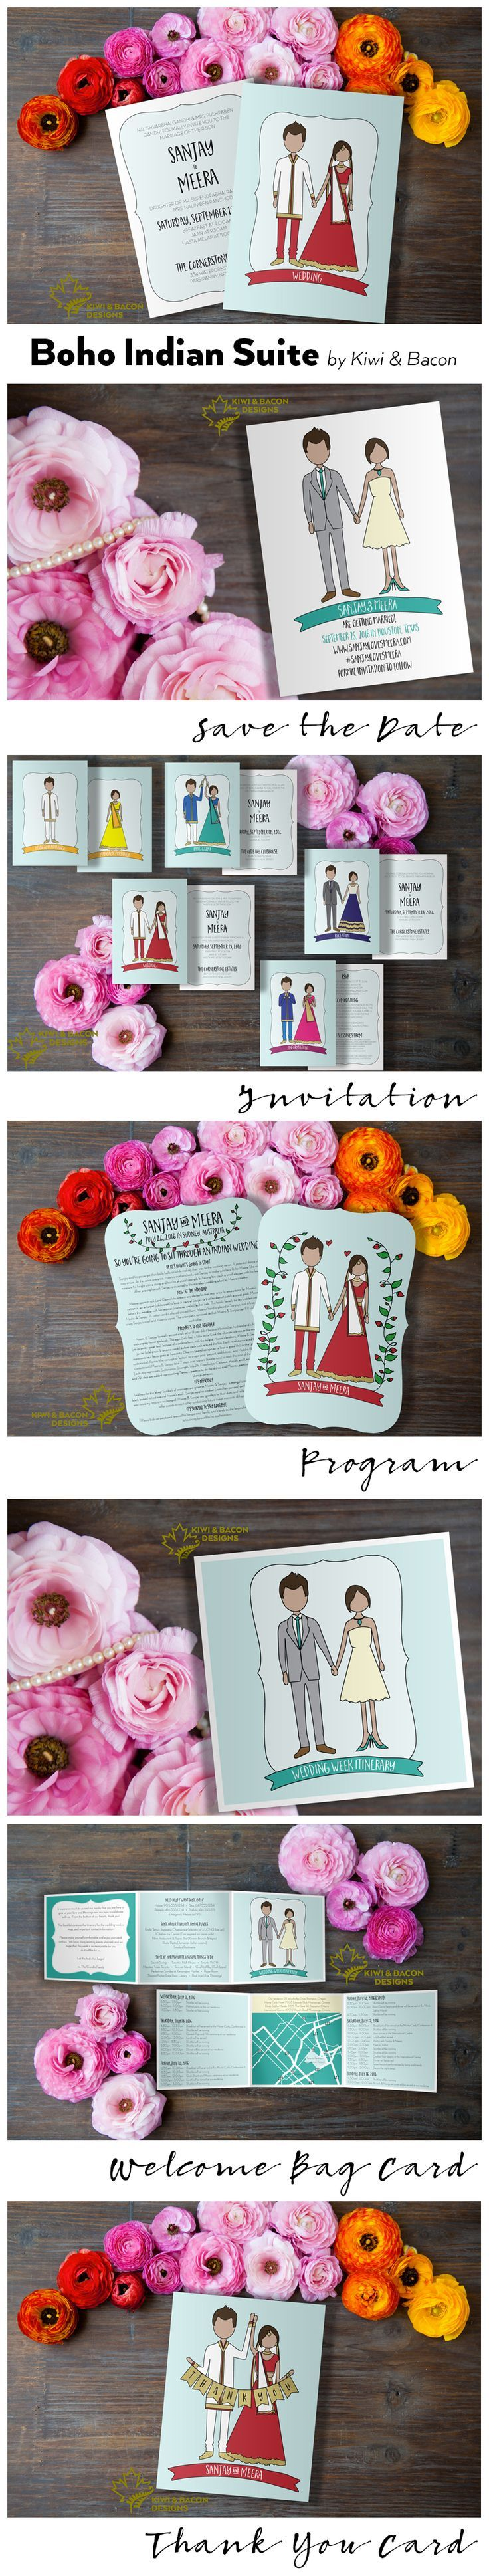 79 best Wedding Invitations images on Pinterest